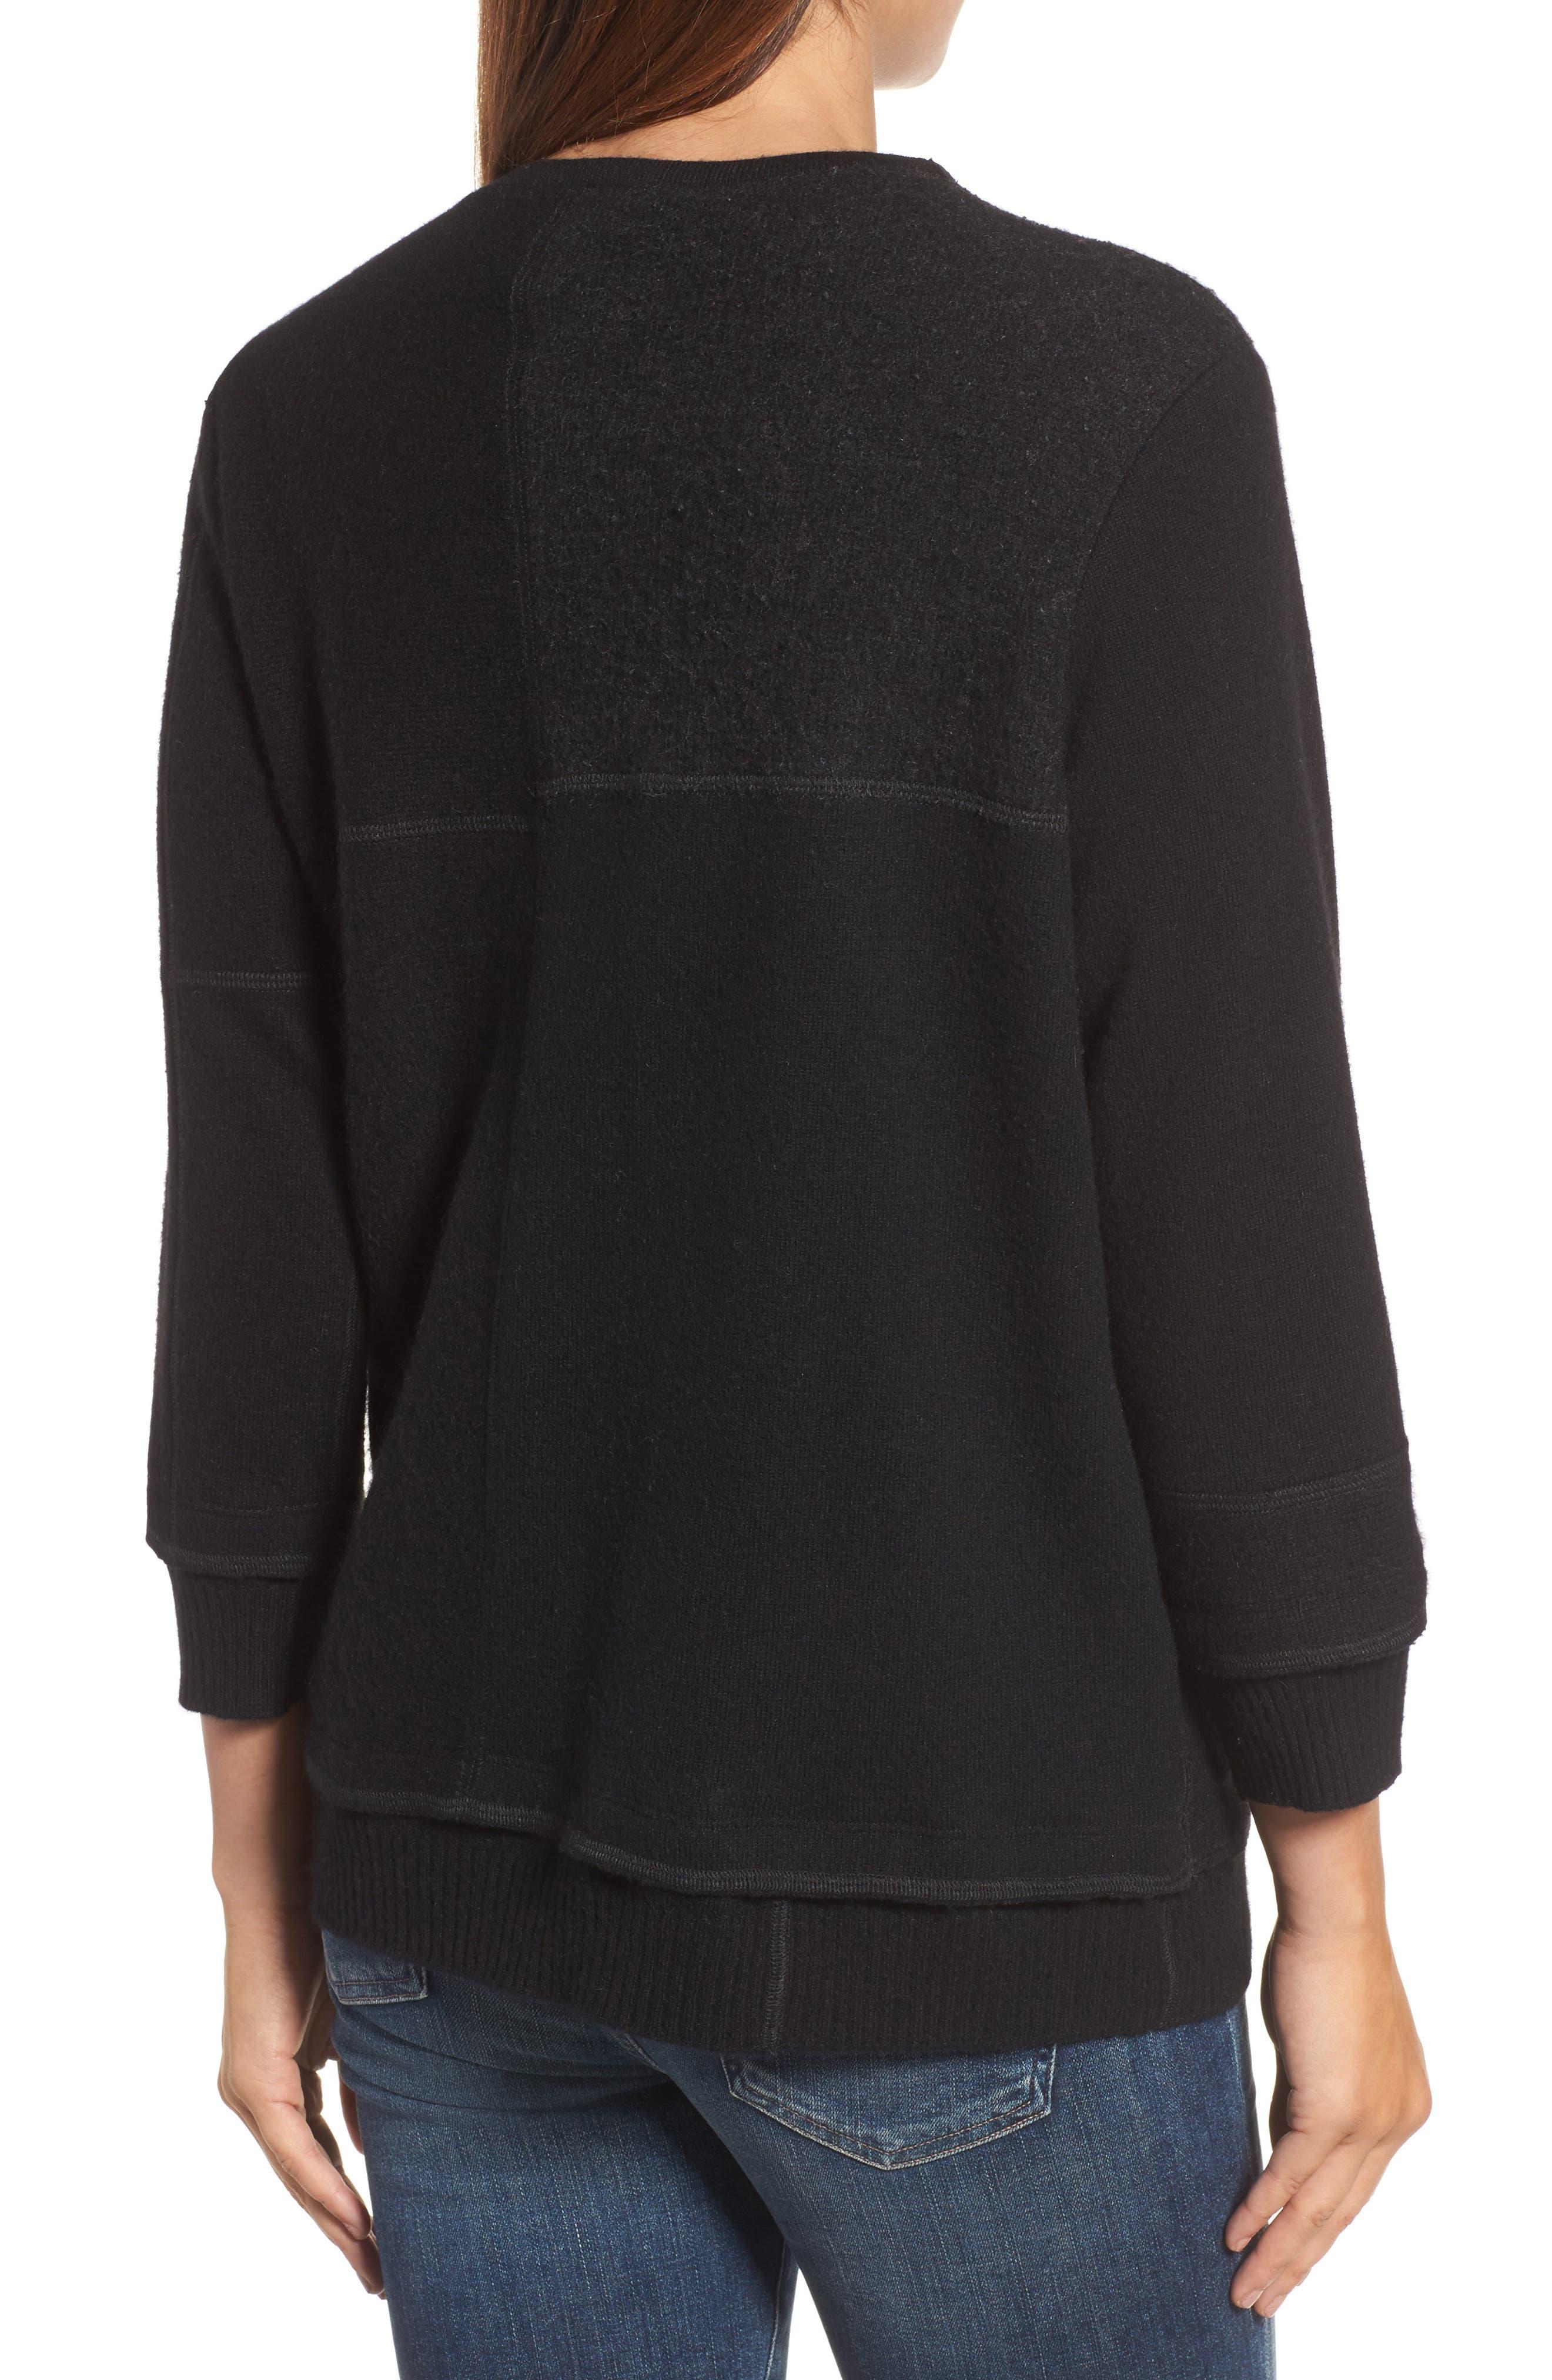 Colorblock Cashmere Sweater,                             Alternate thumbnail 2, color,                             001